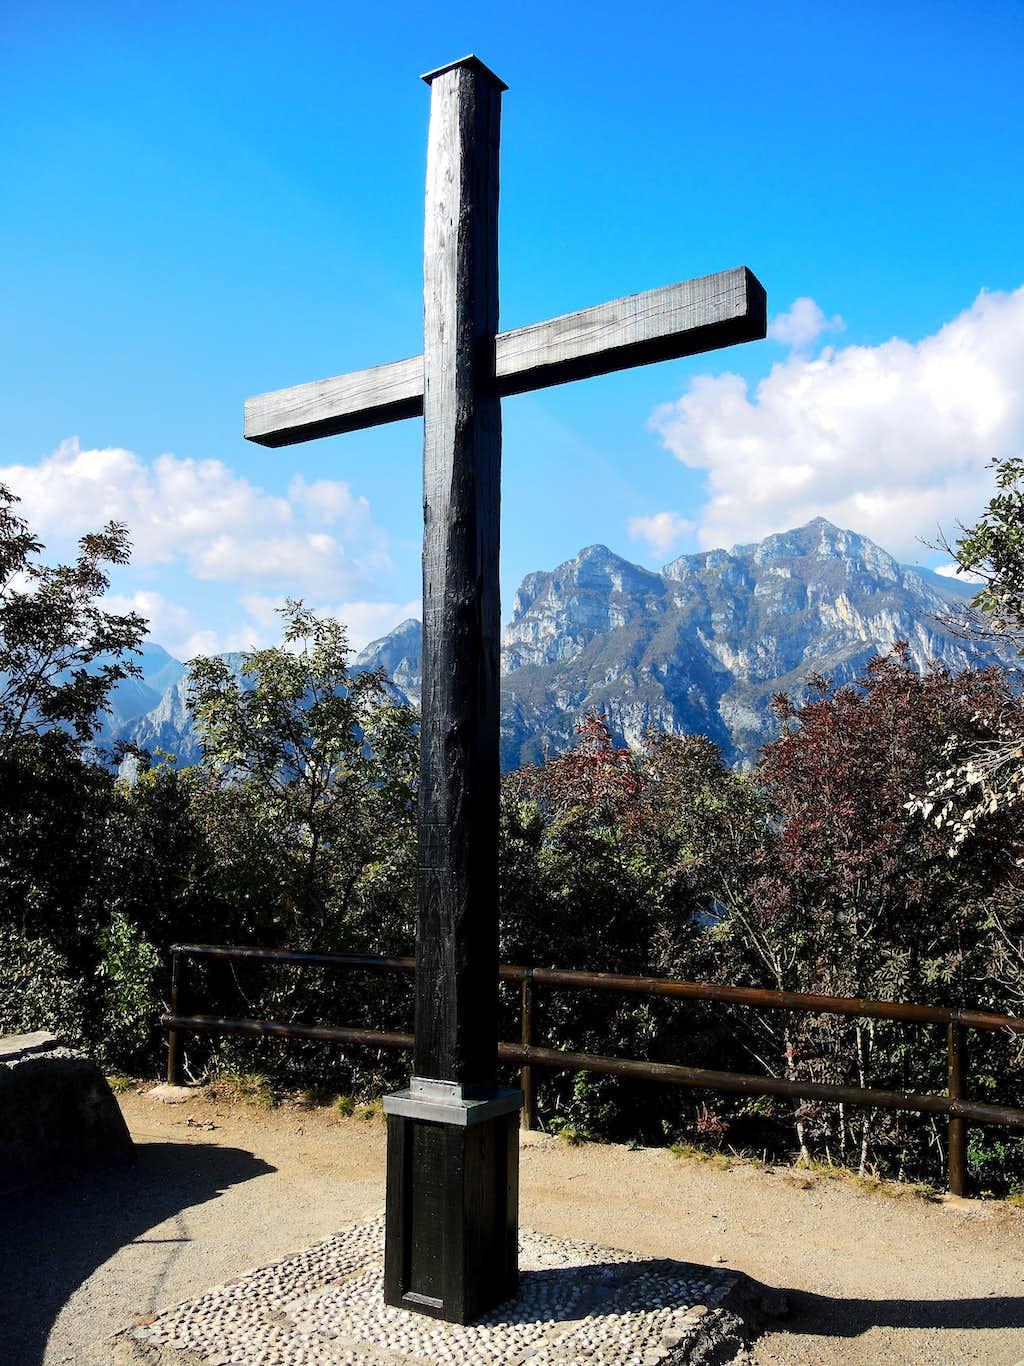 The cross of Monte Brione